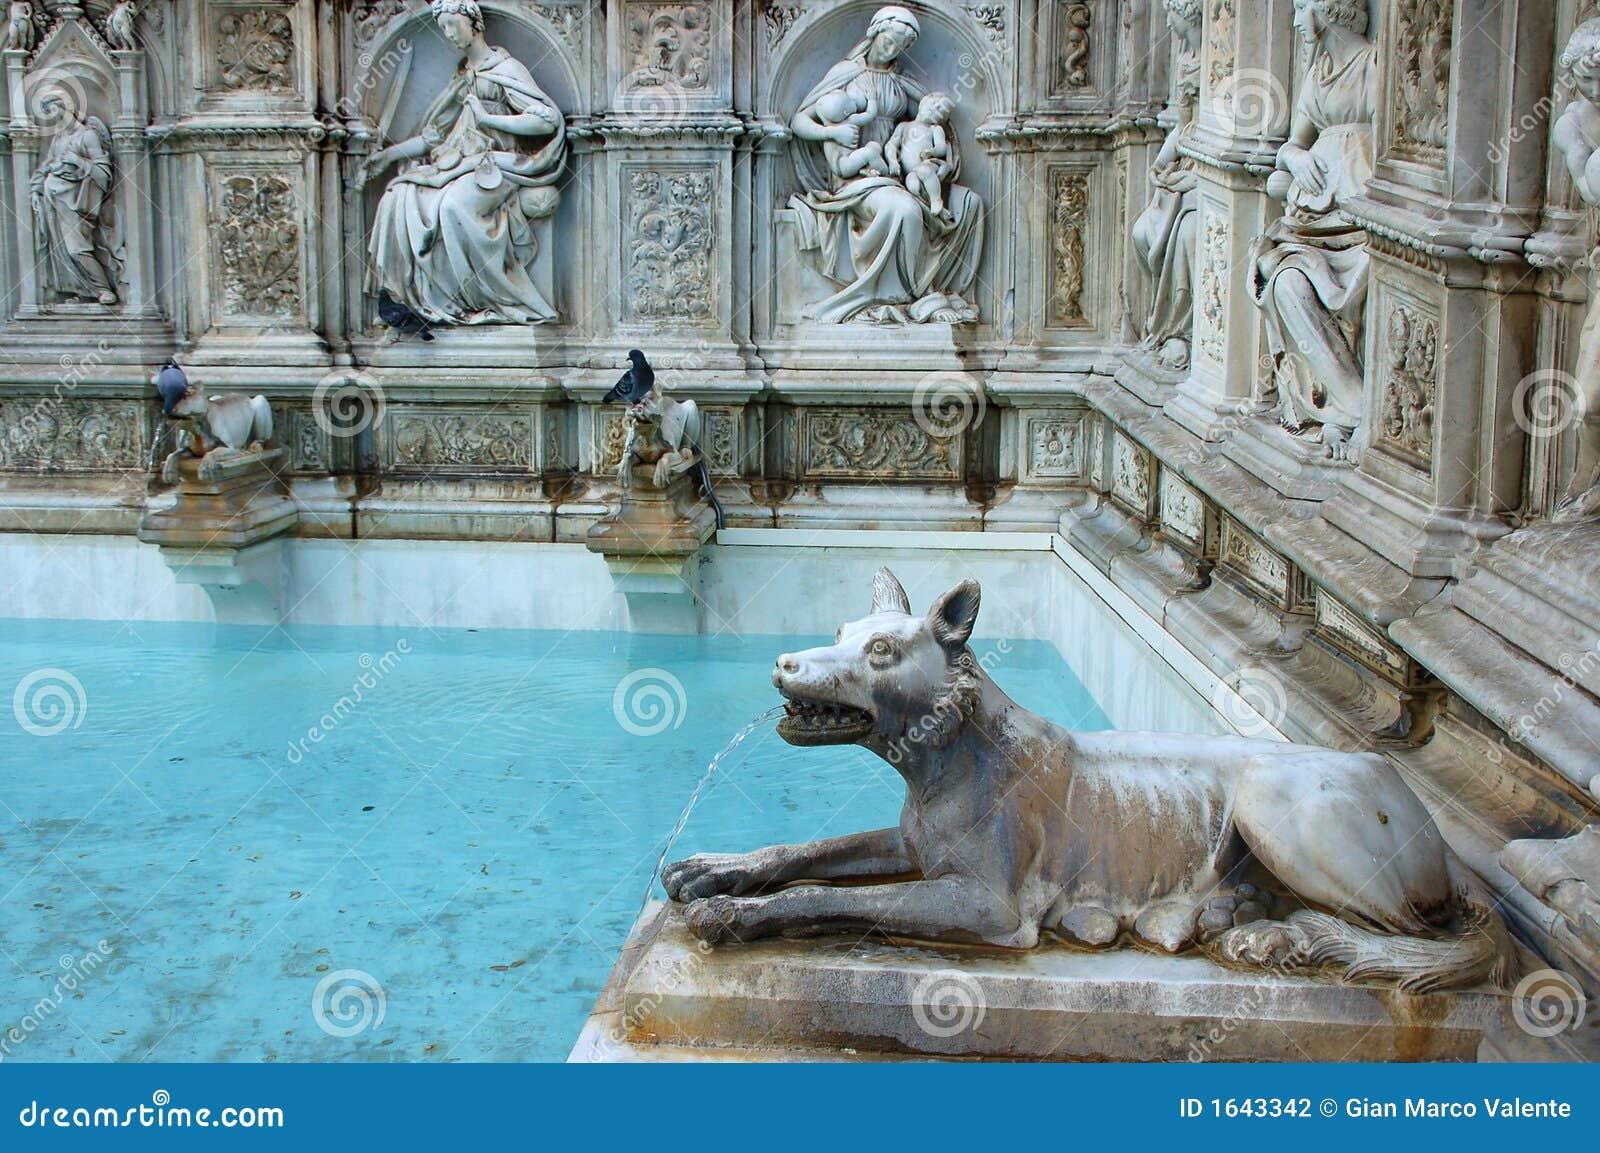 Fonte gaia siena stock photo image of artistic - Fontaine exterieure fonte ...